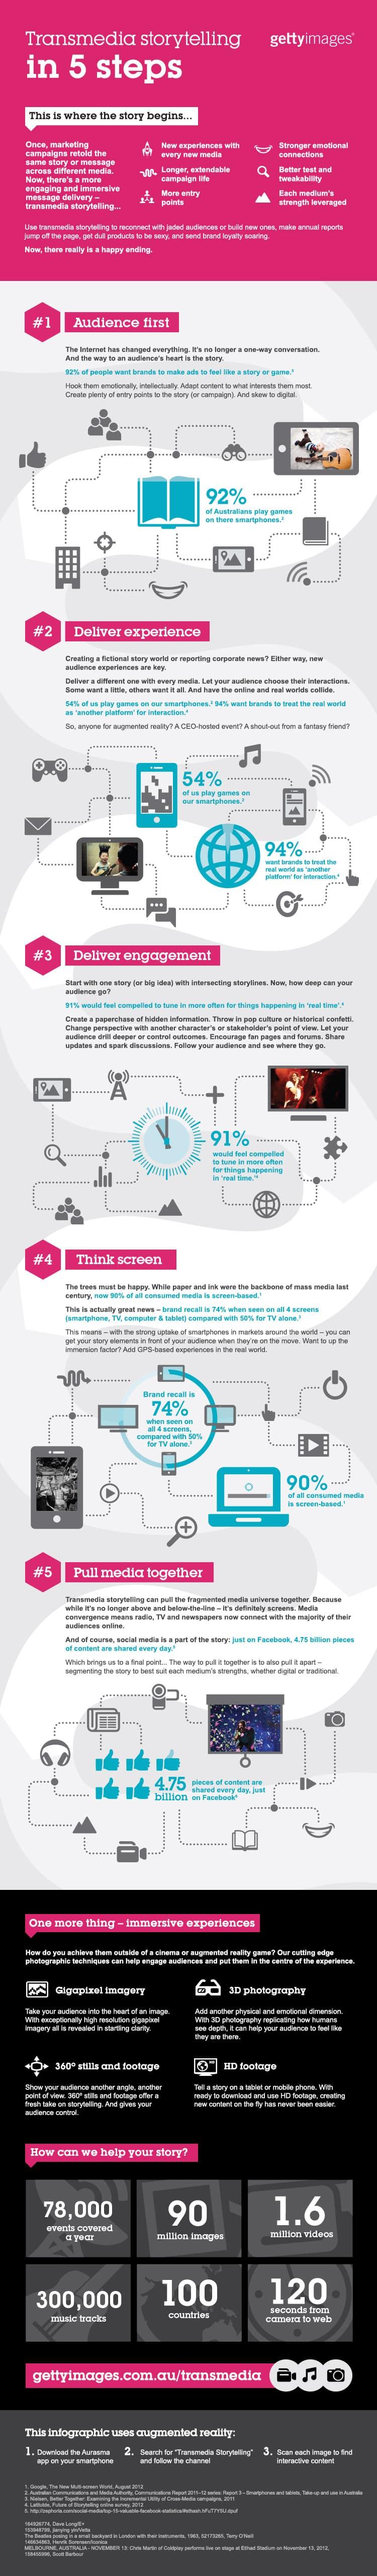 infographic_5_steps_storytelling